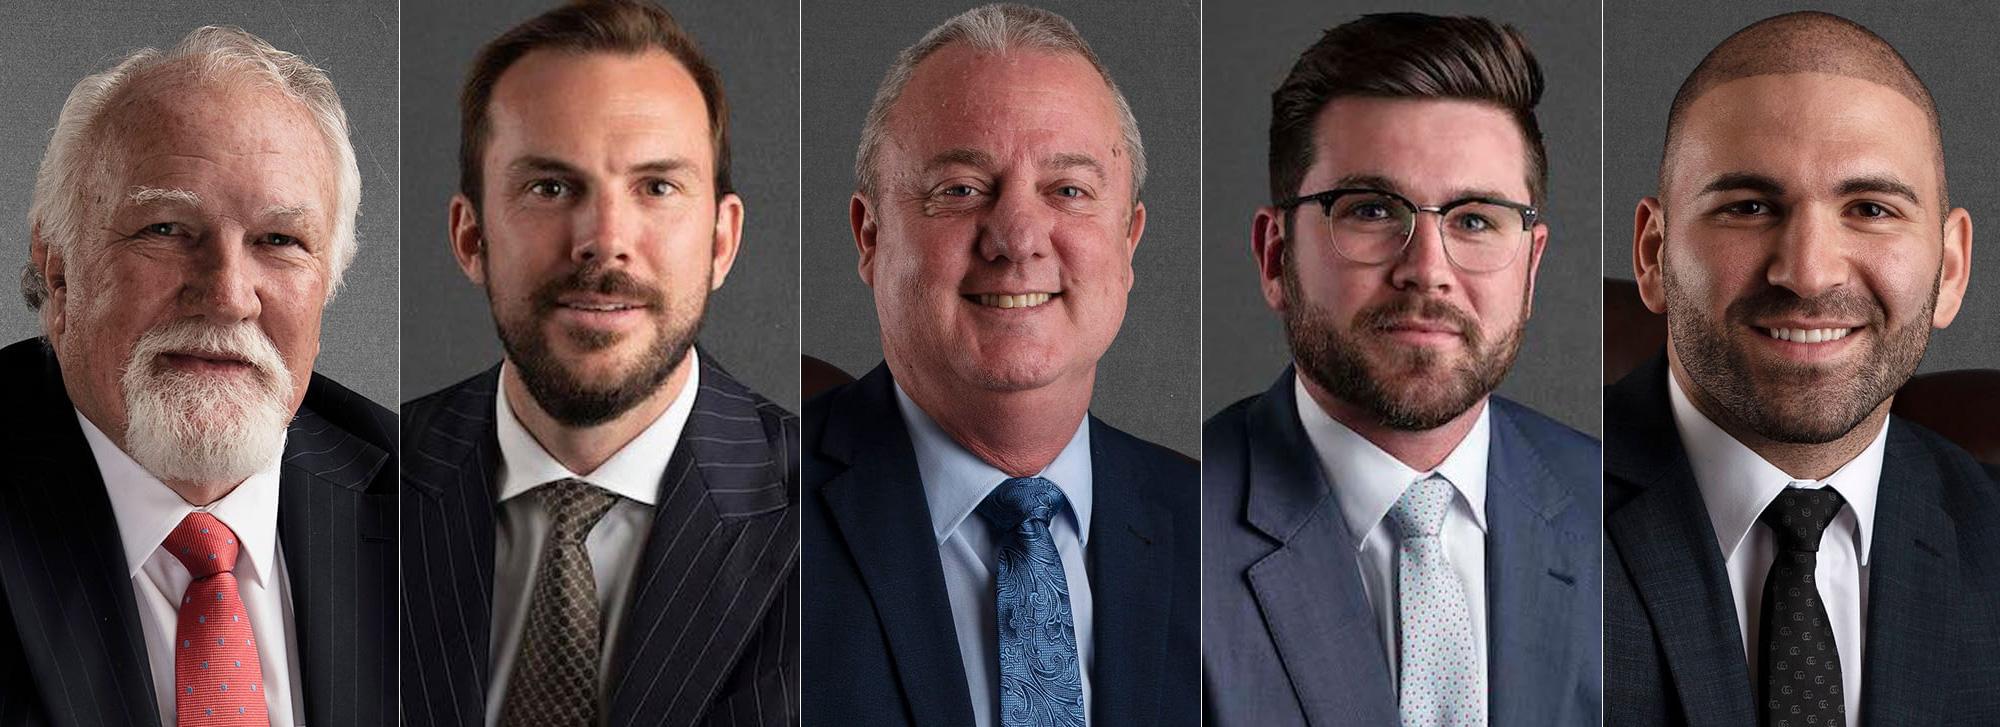 Criminal Lawyers Gold Coast - Hannay Lawyers